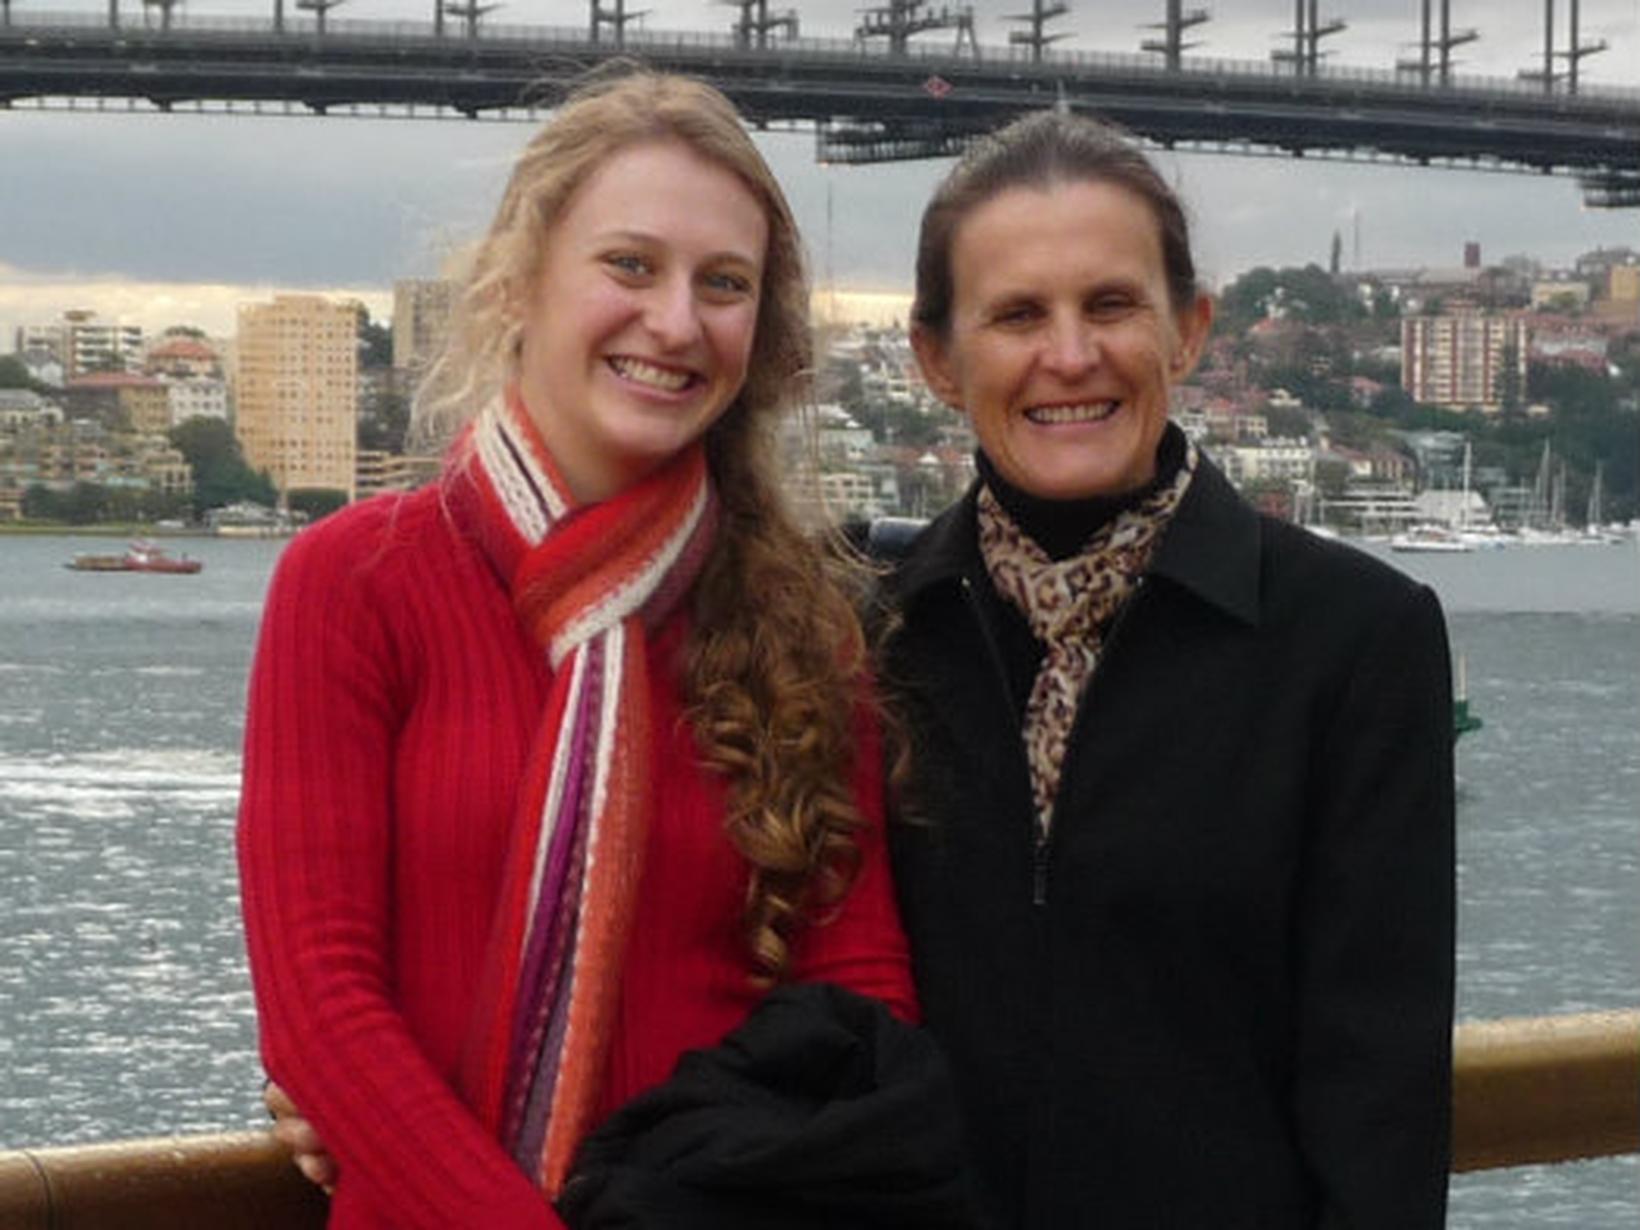 Pam & Ian from Maryborough, Queensland, Australia